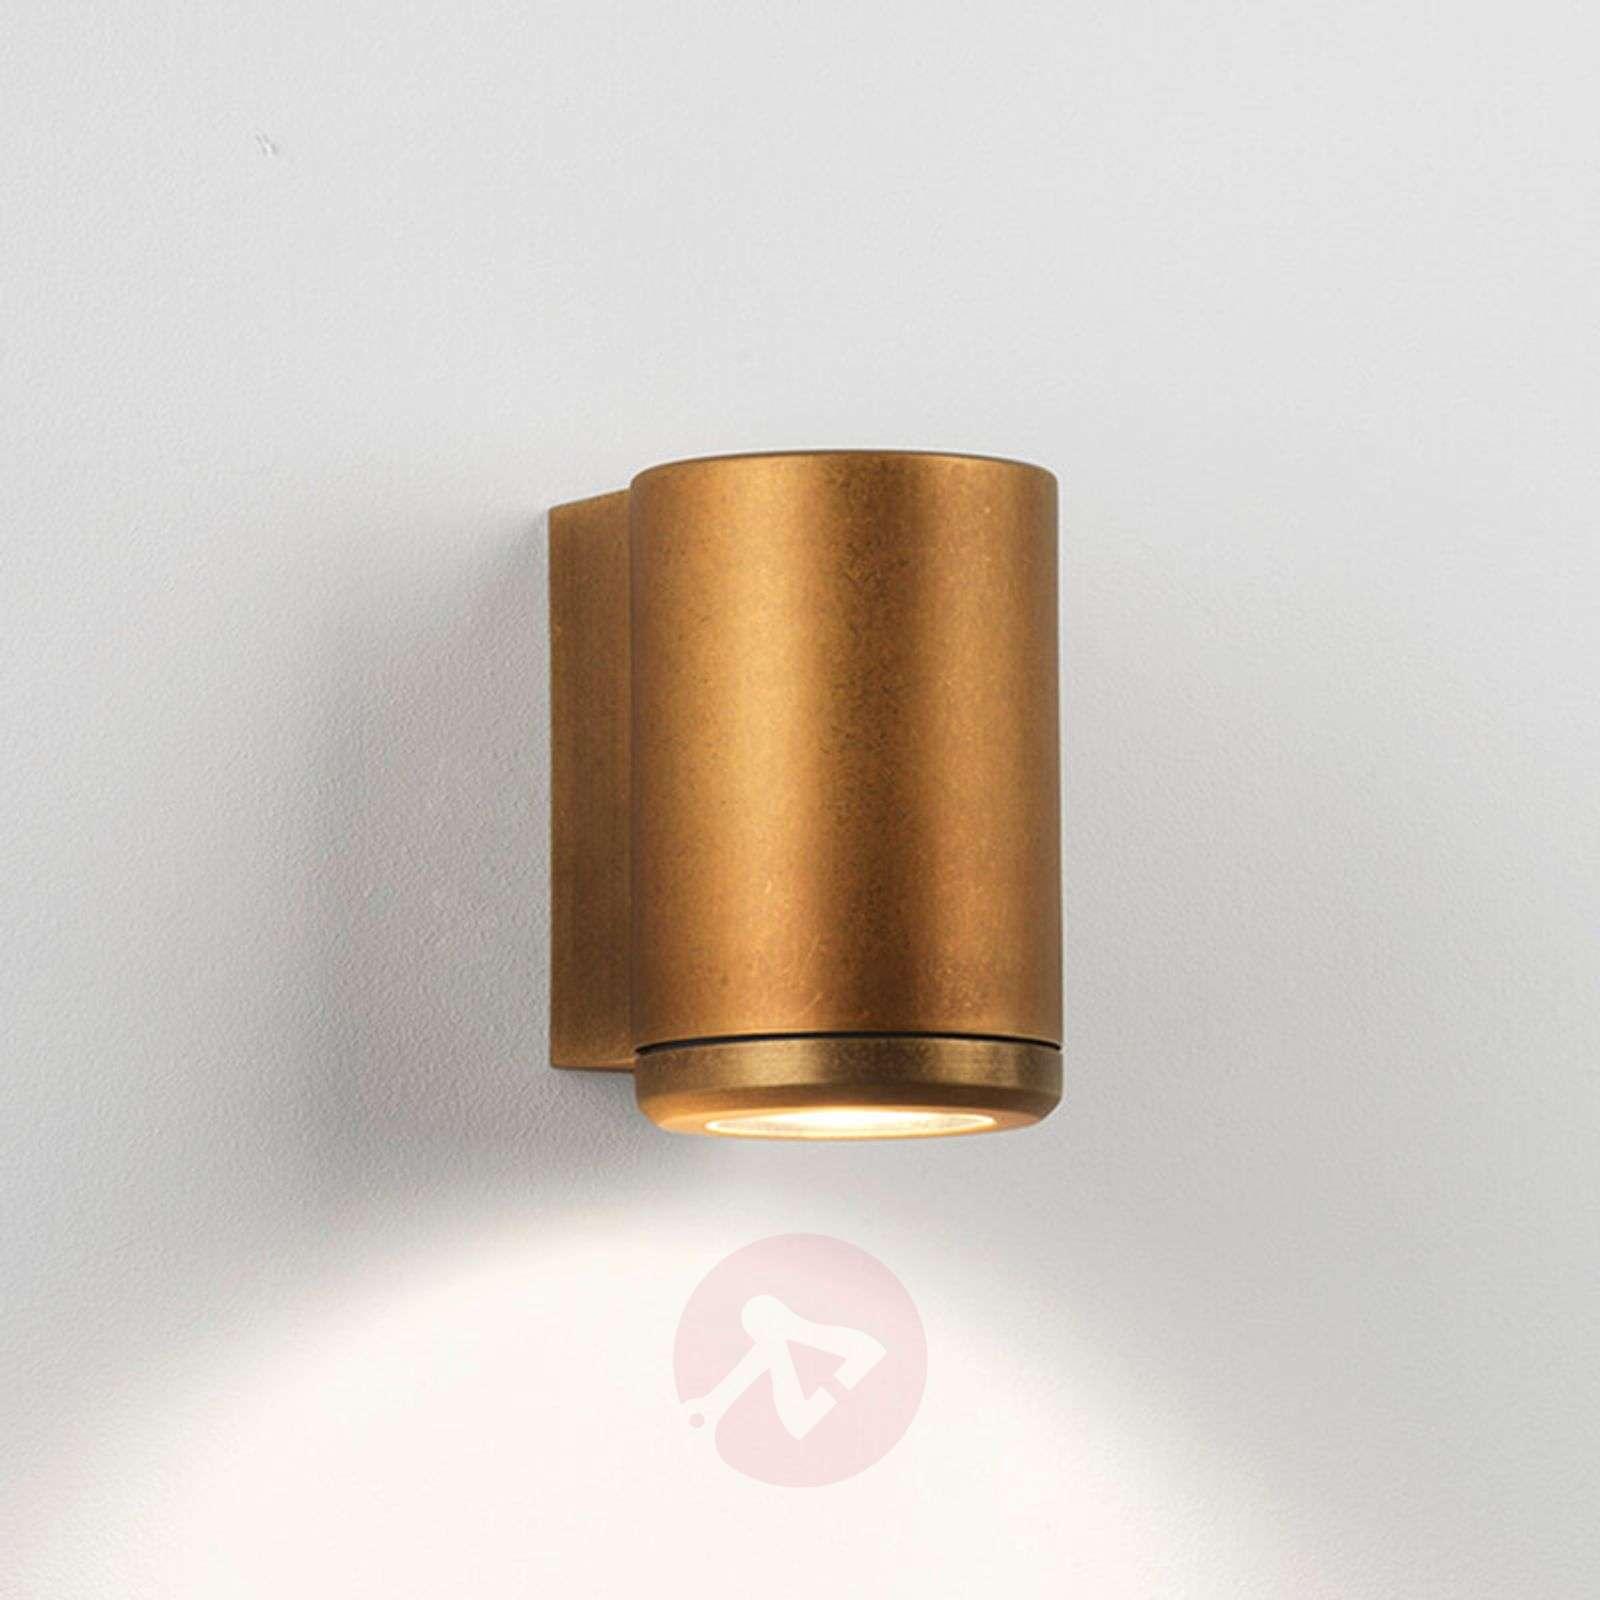 Jura Single high-quality brassoutdoor wall light-1020575-01